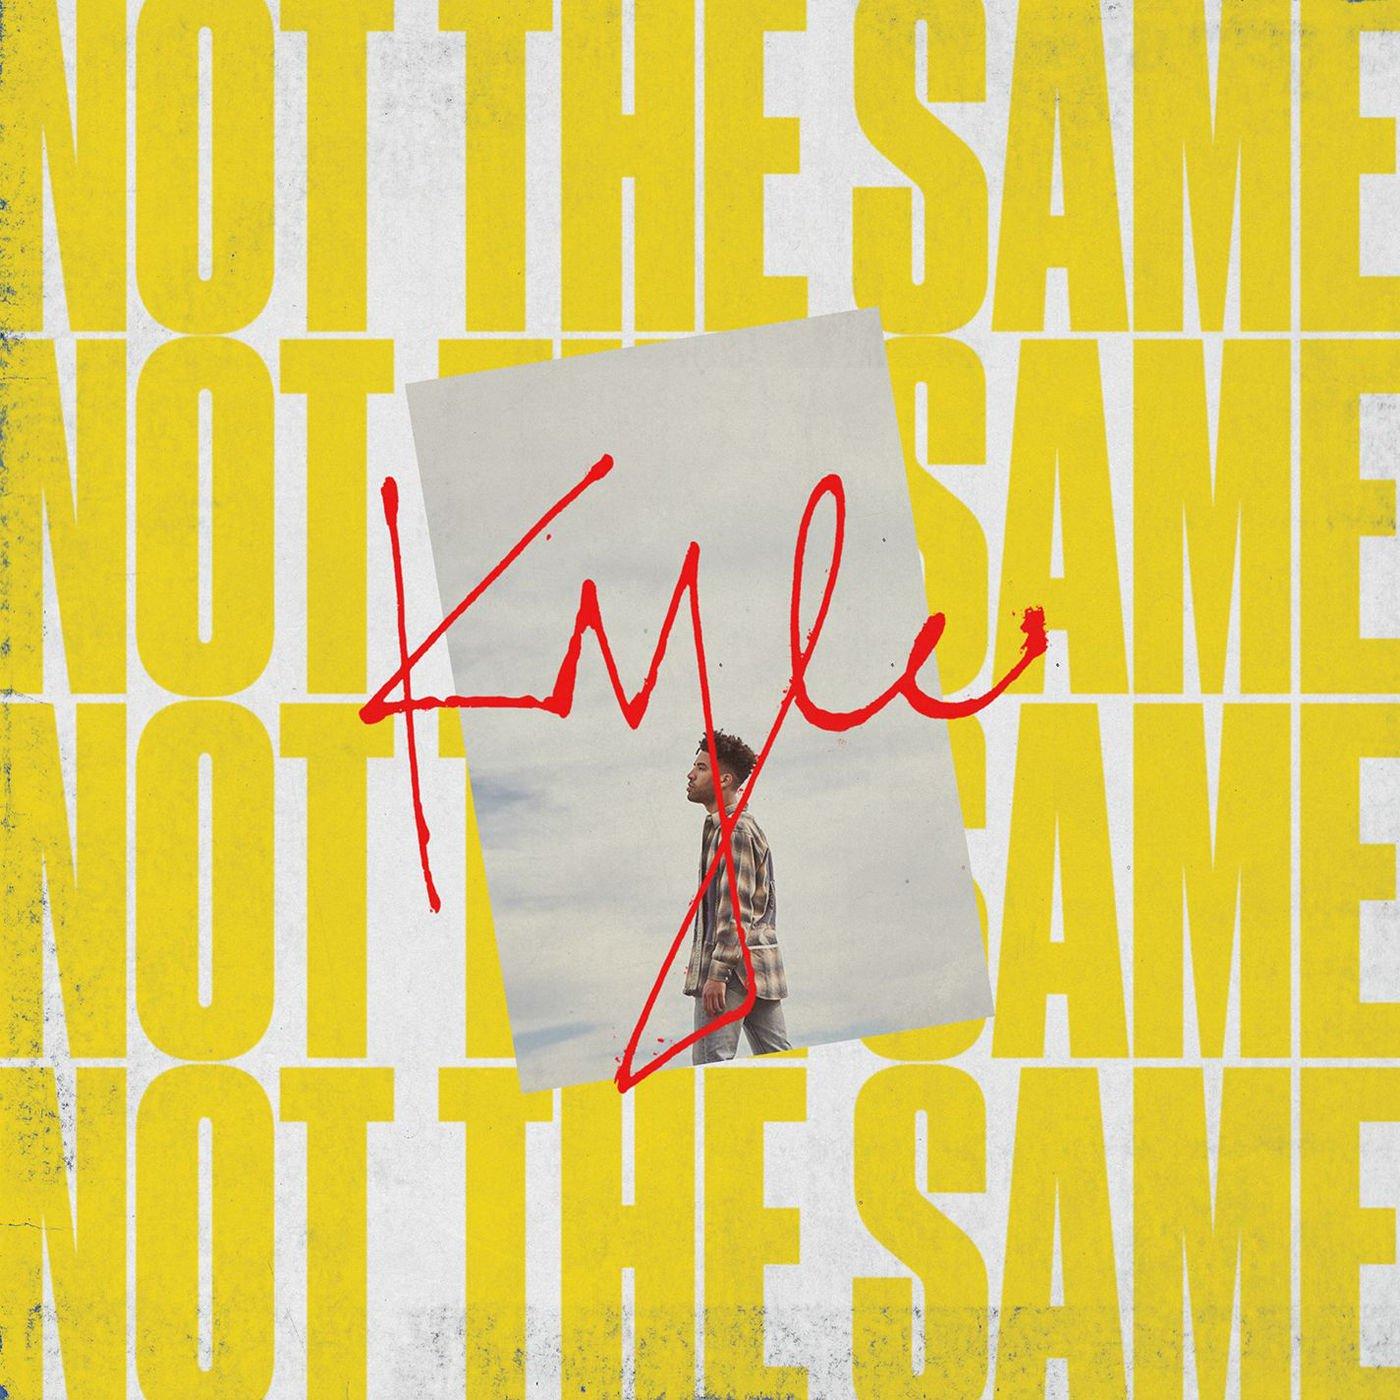 New Music: @SuperDuperKyle 'Not the Same' https://t.co/FxOQzSN6Ik  https://t.co/csfyrrtmXe